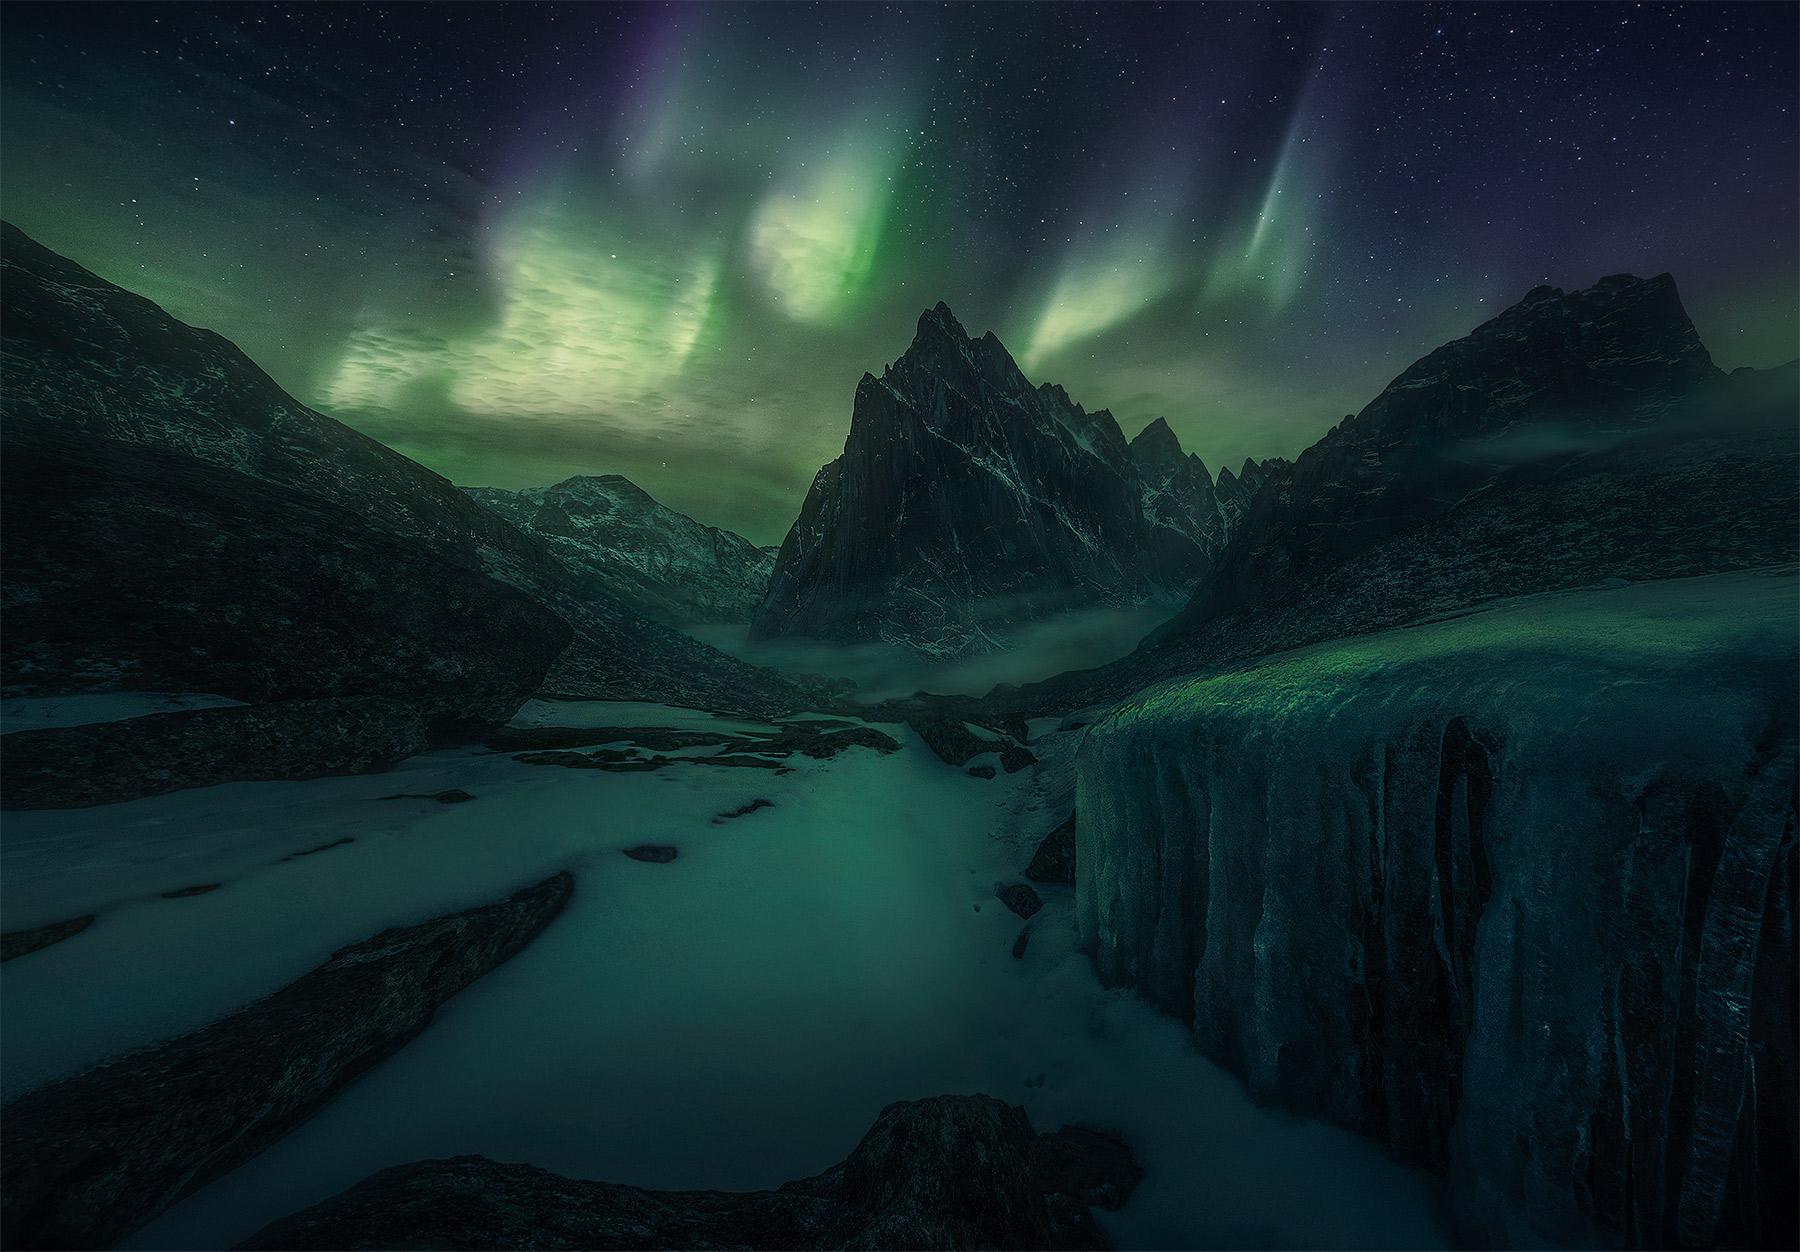 Mackenzie mountains, northwest territories, Canada, peaks, aurora, snow, cold, far north, nahanni, photo